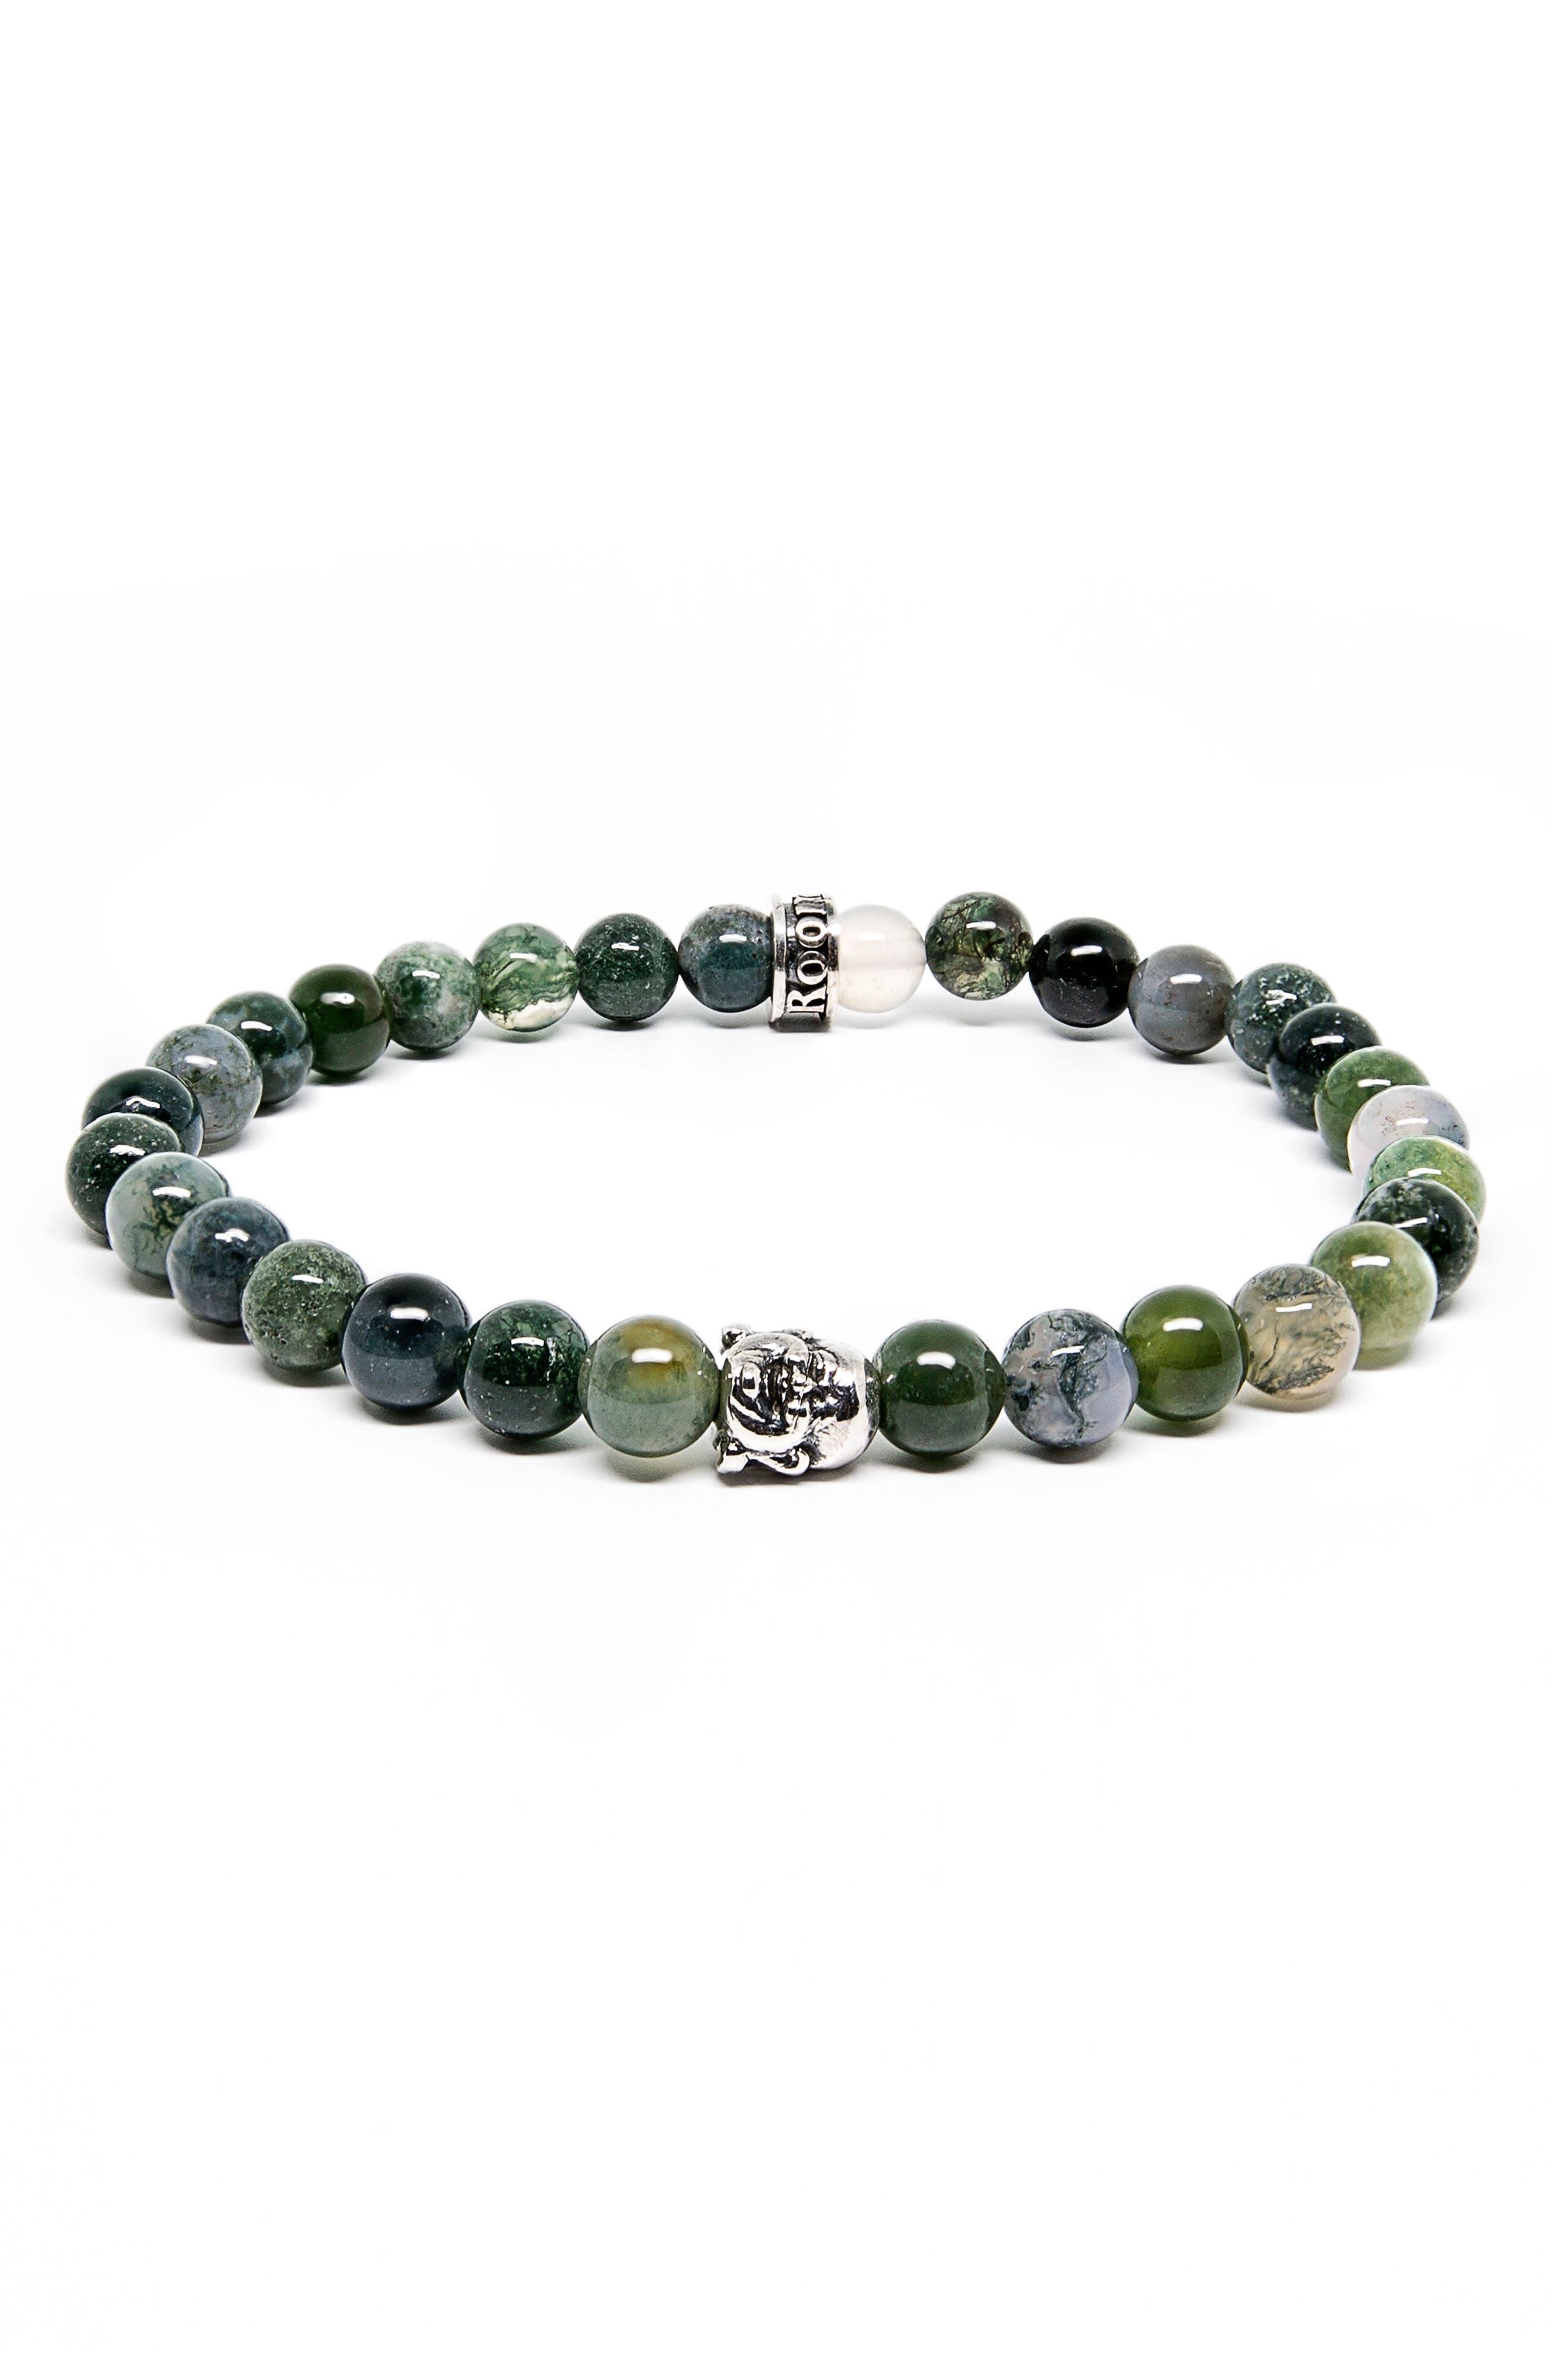 Alternate Image 1 Selected - Room101 Moss Agate Buddha Stretch Bracelet